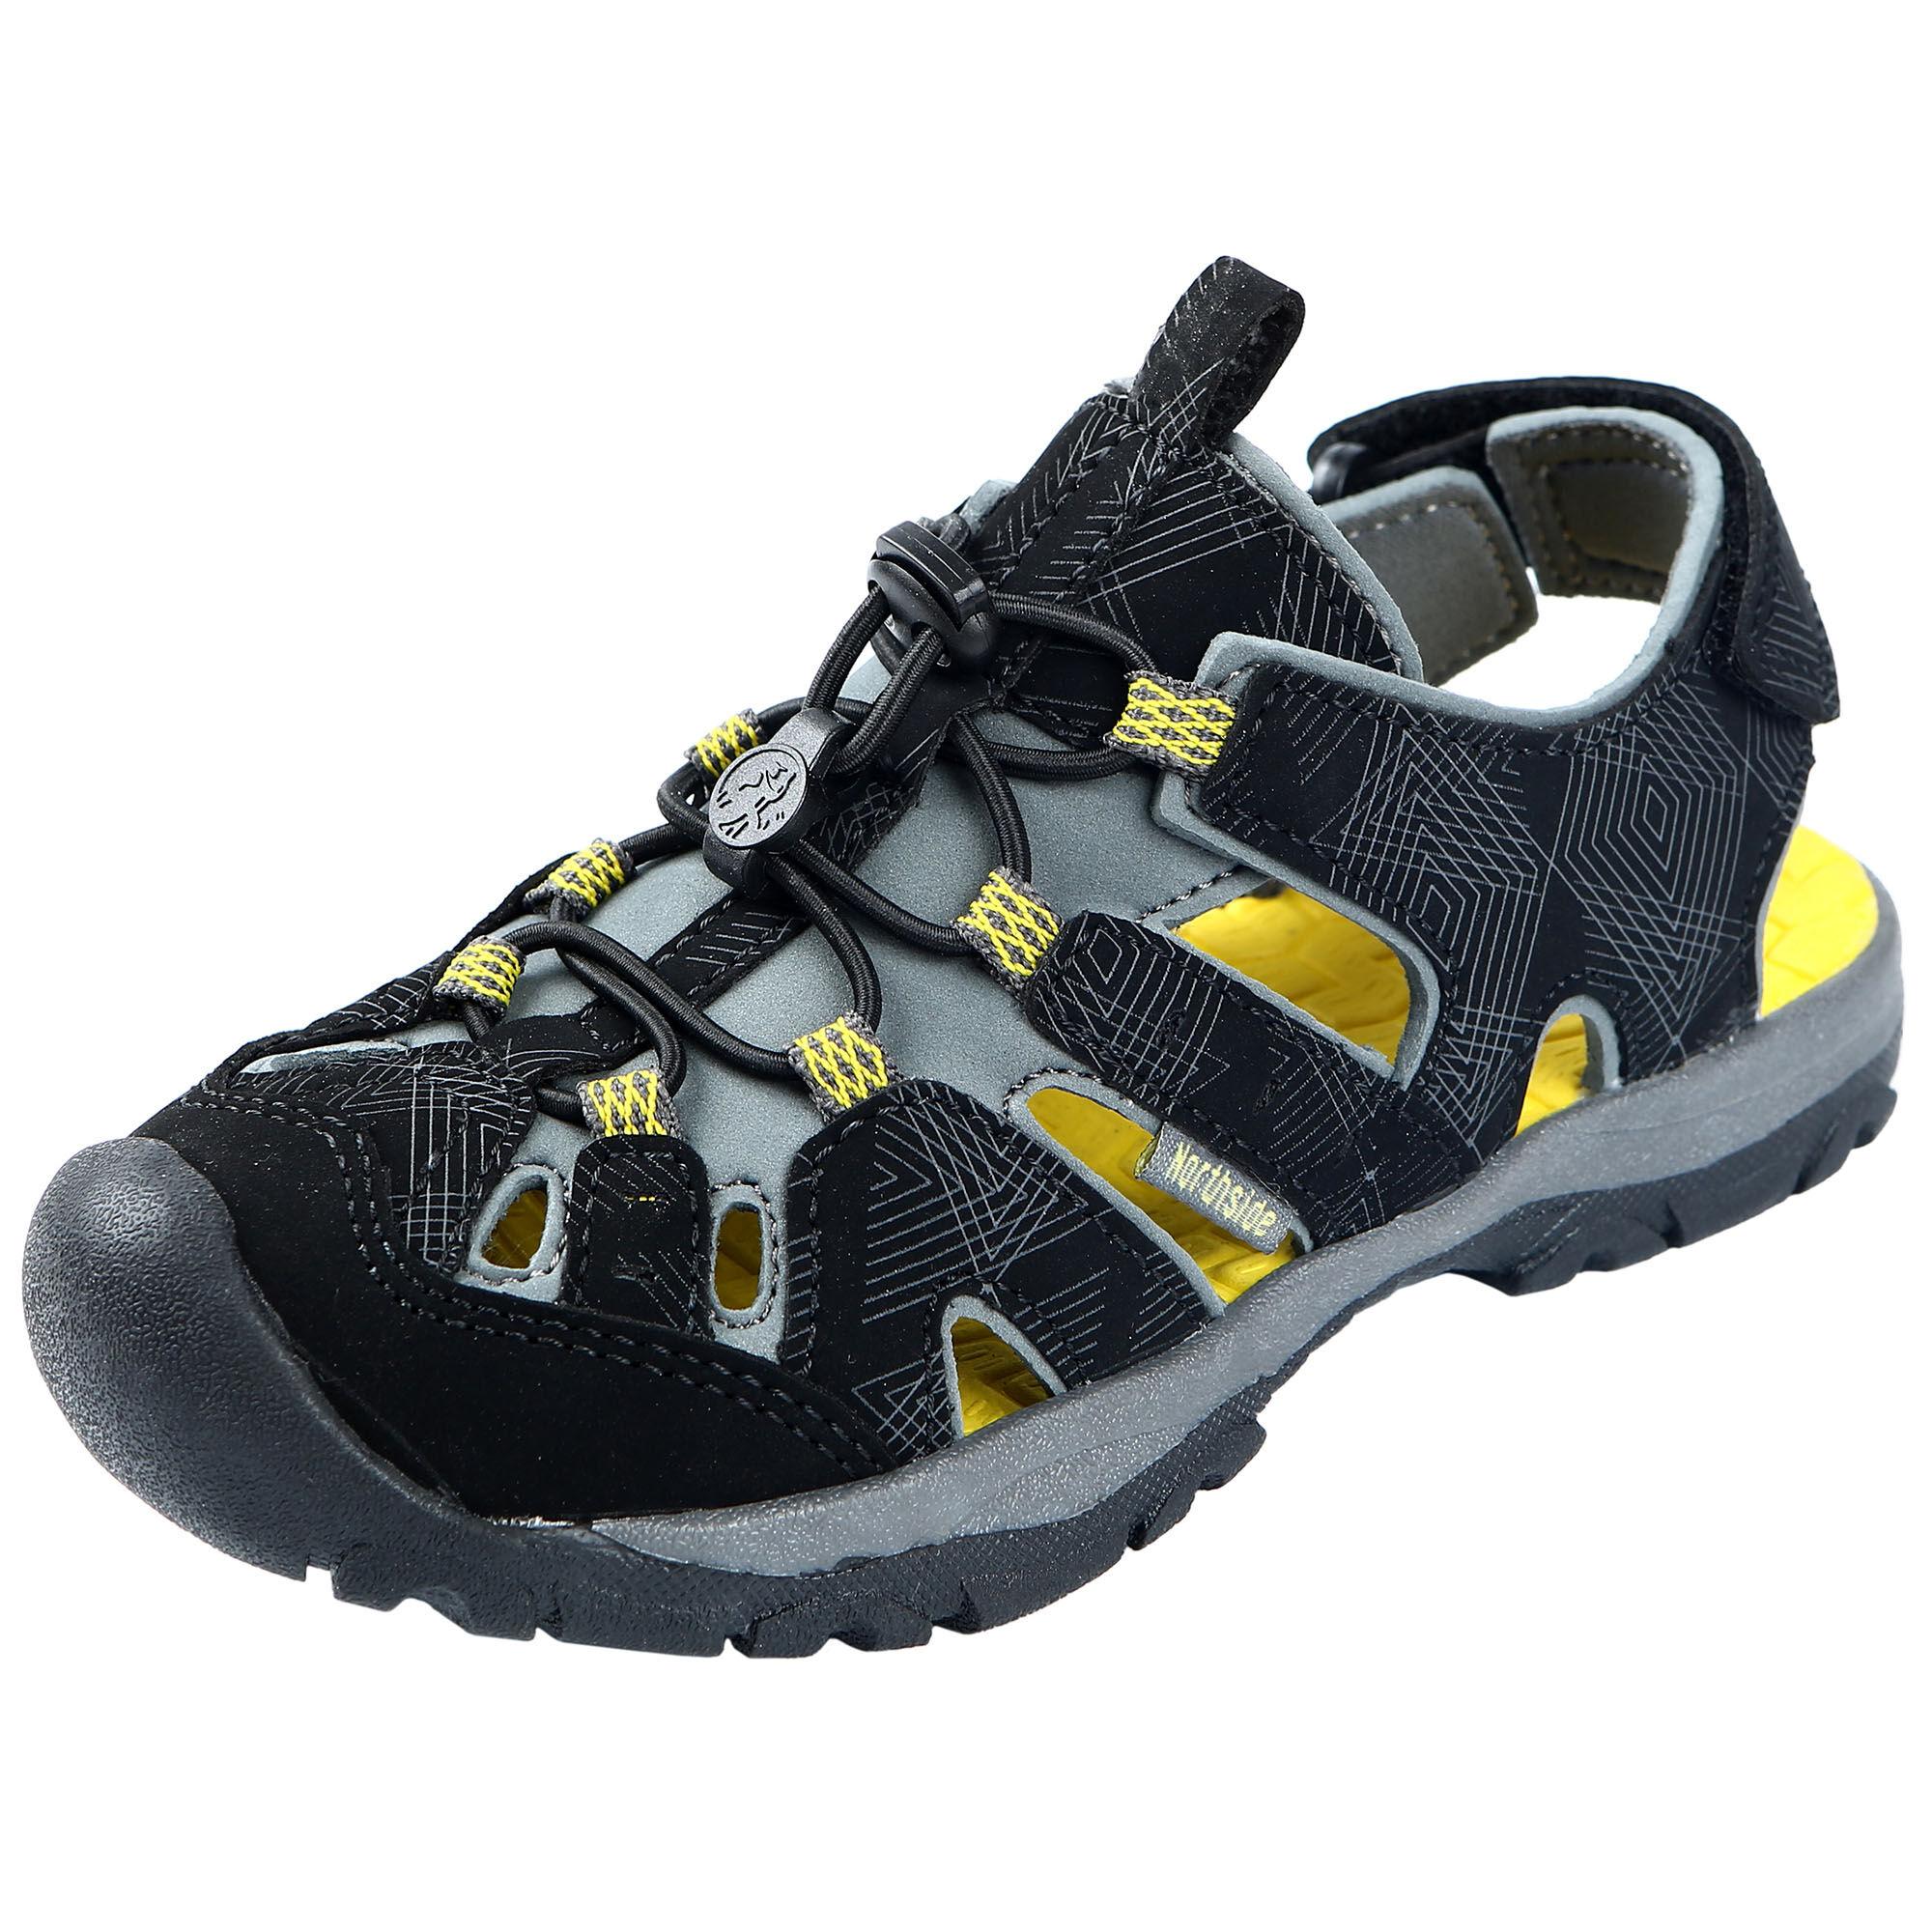 Northside Boy's Burke SE Sport Sandals  - Black/Yellow - Size: 1